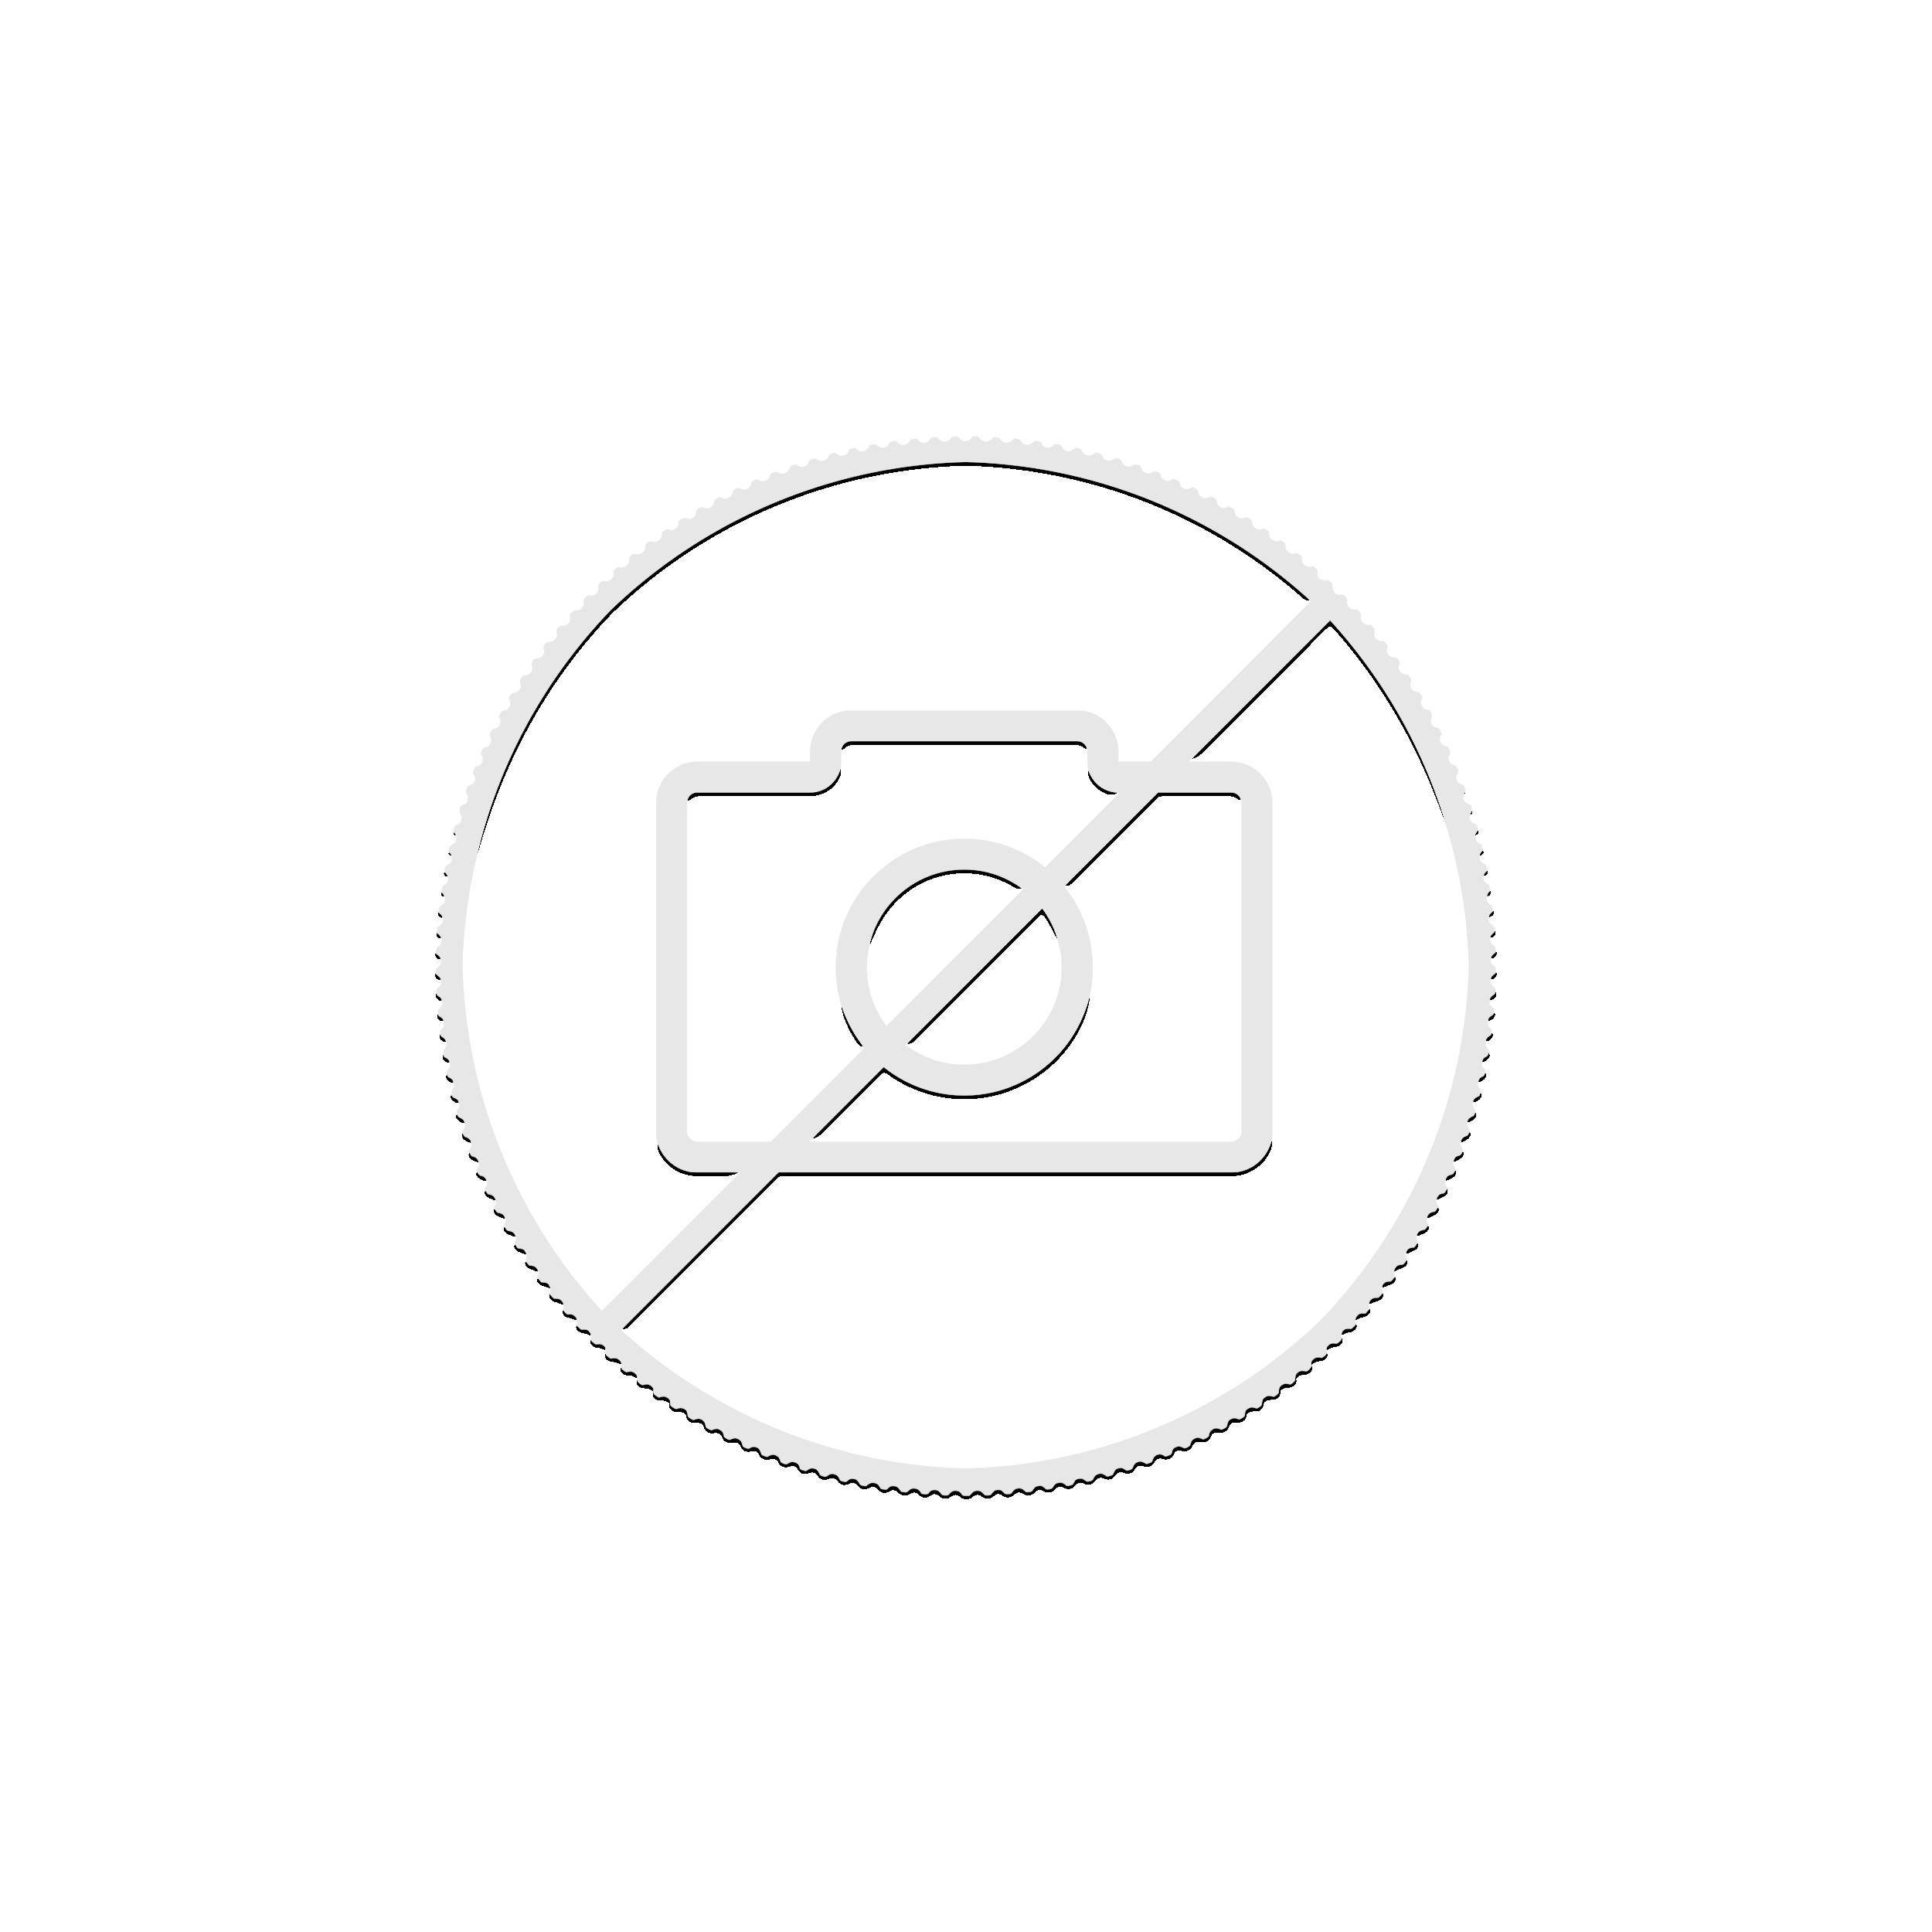 150 Grams gold coin Panda 2021 Proof